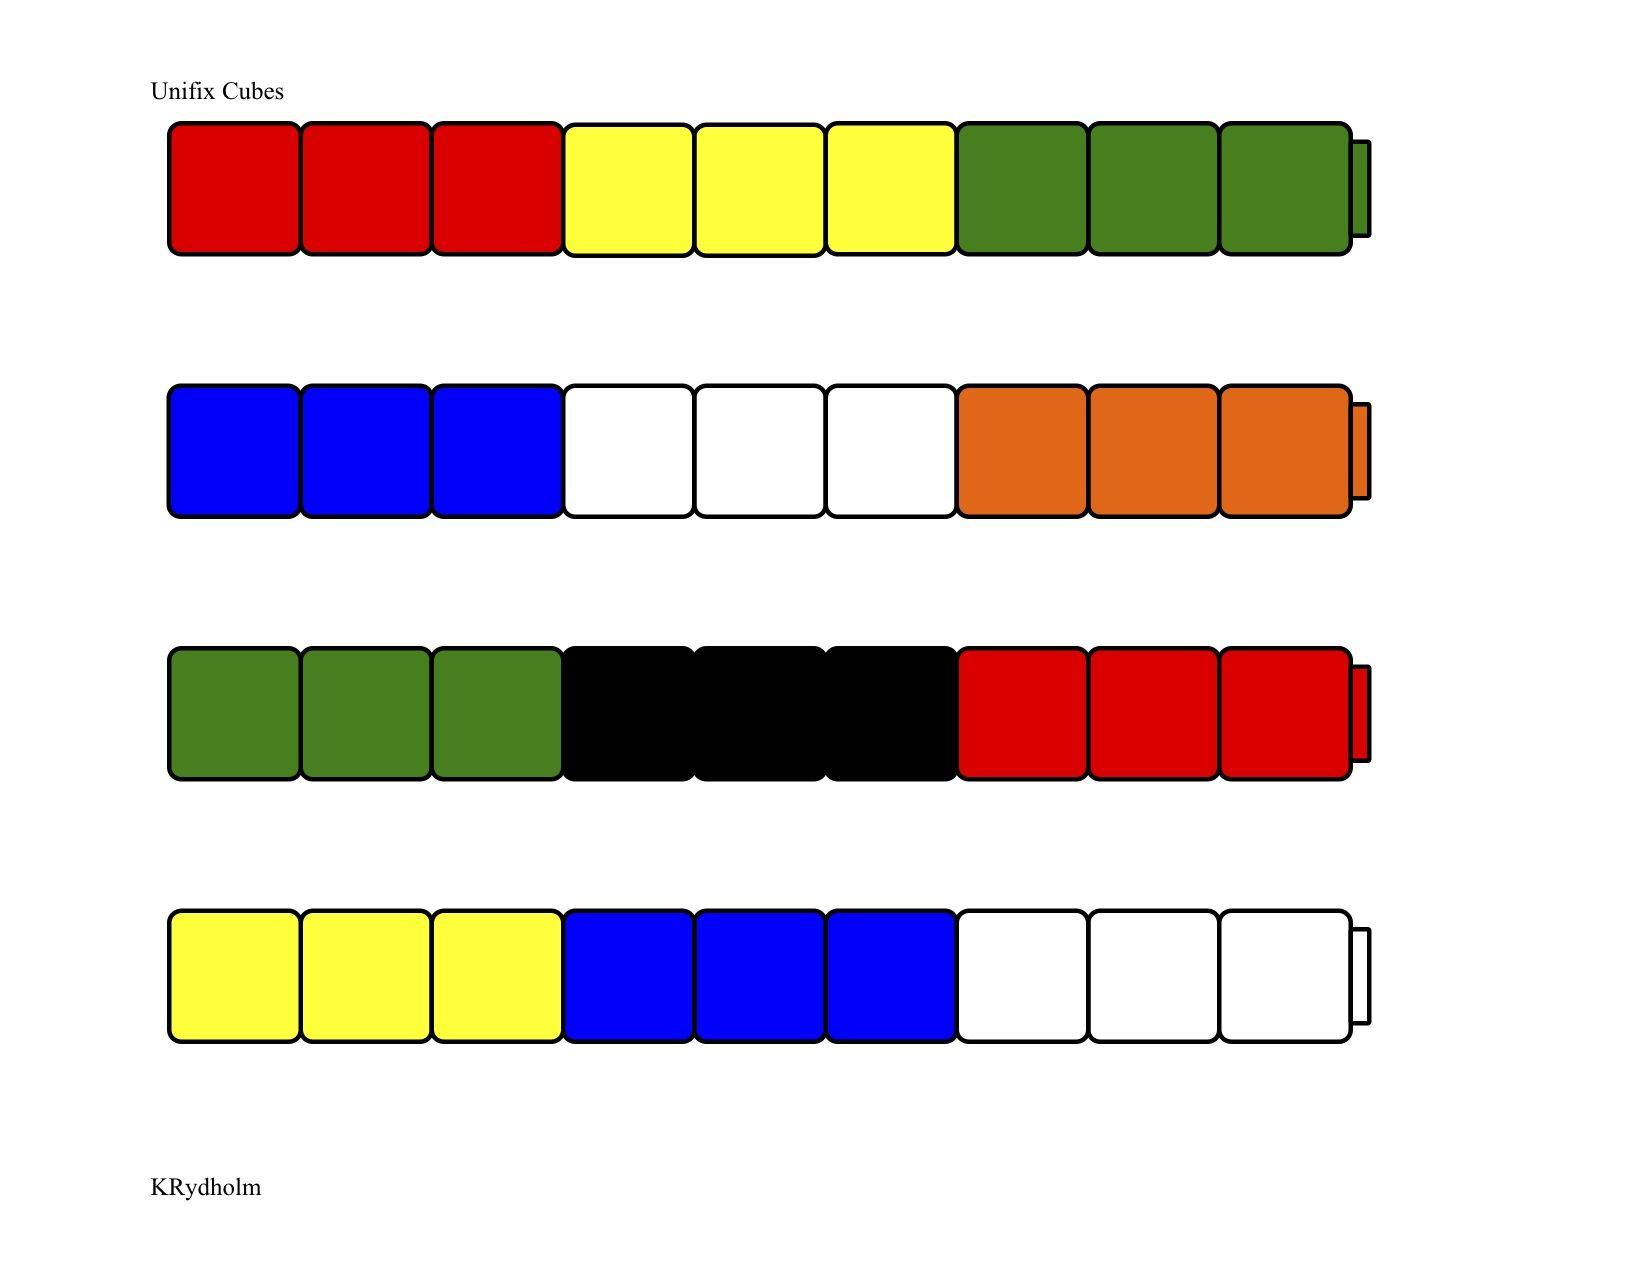 Unifix Patterns 3